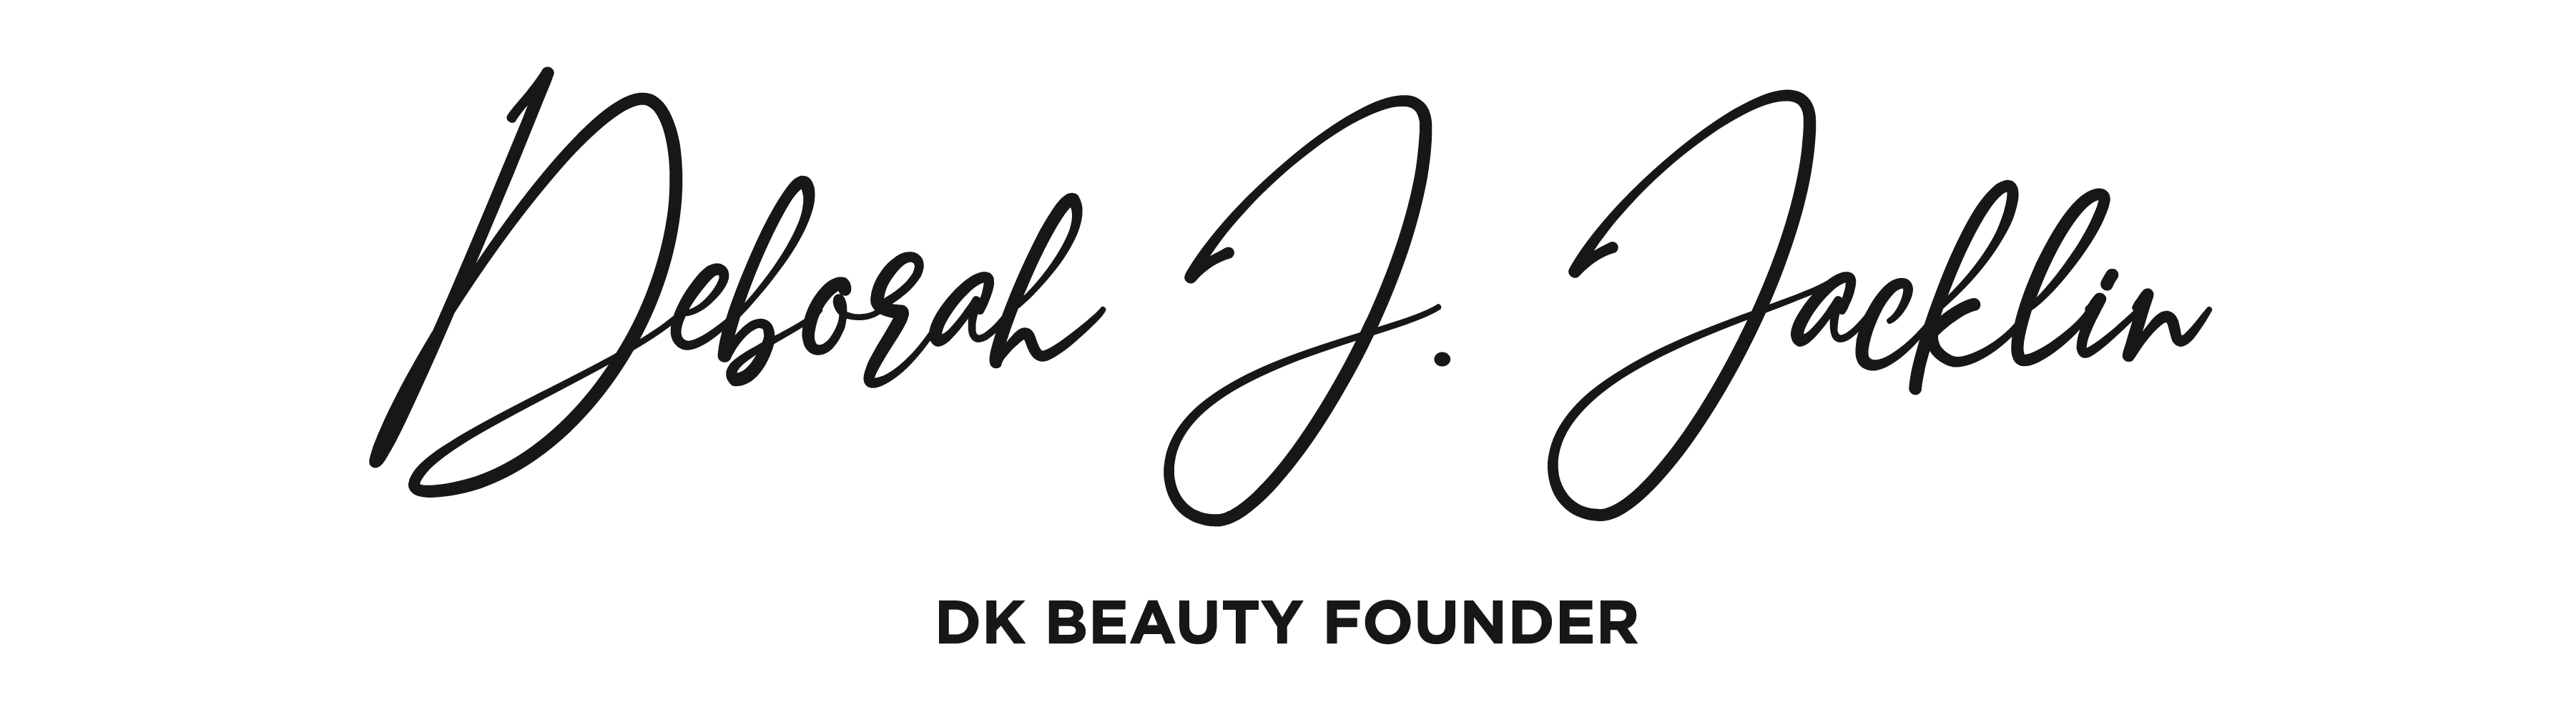 deborah-dk-beauty-signature-web-centered.png